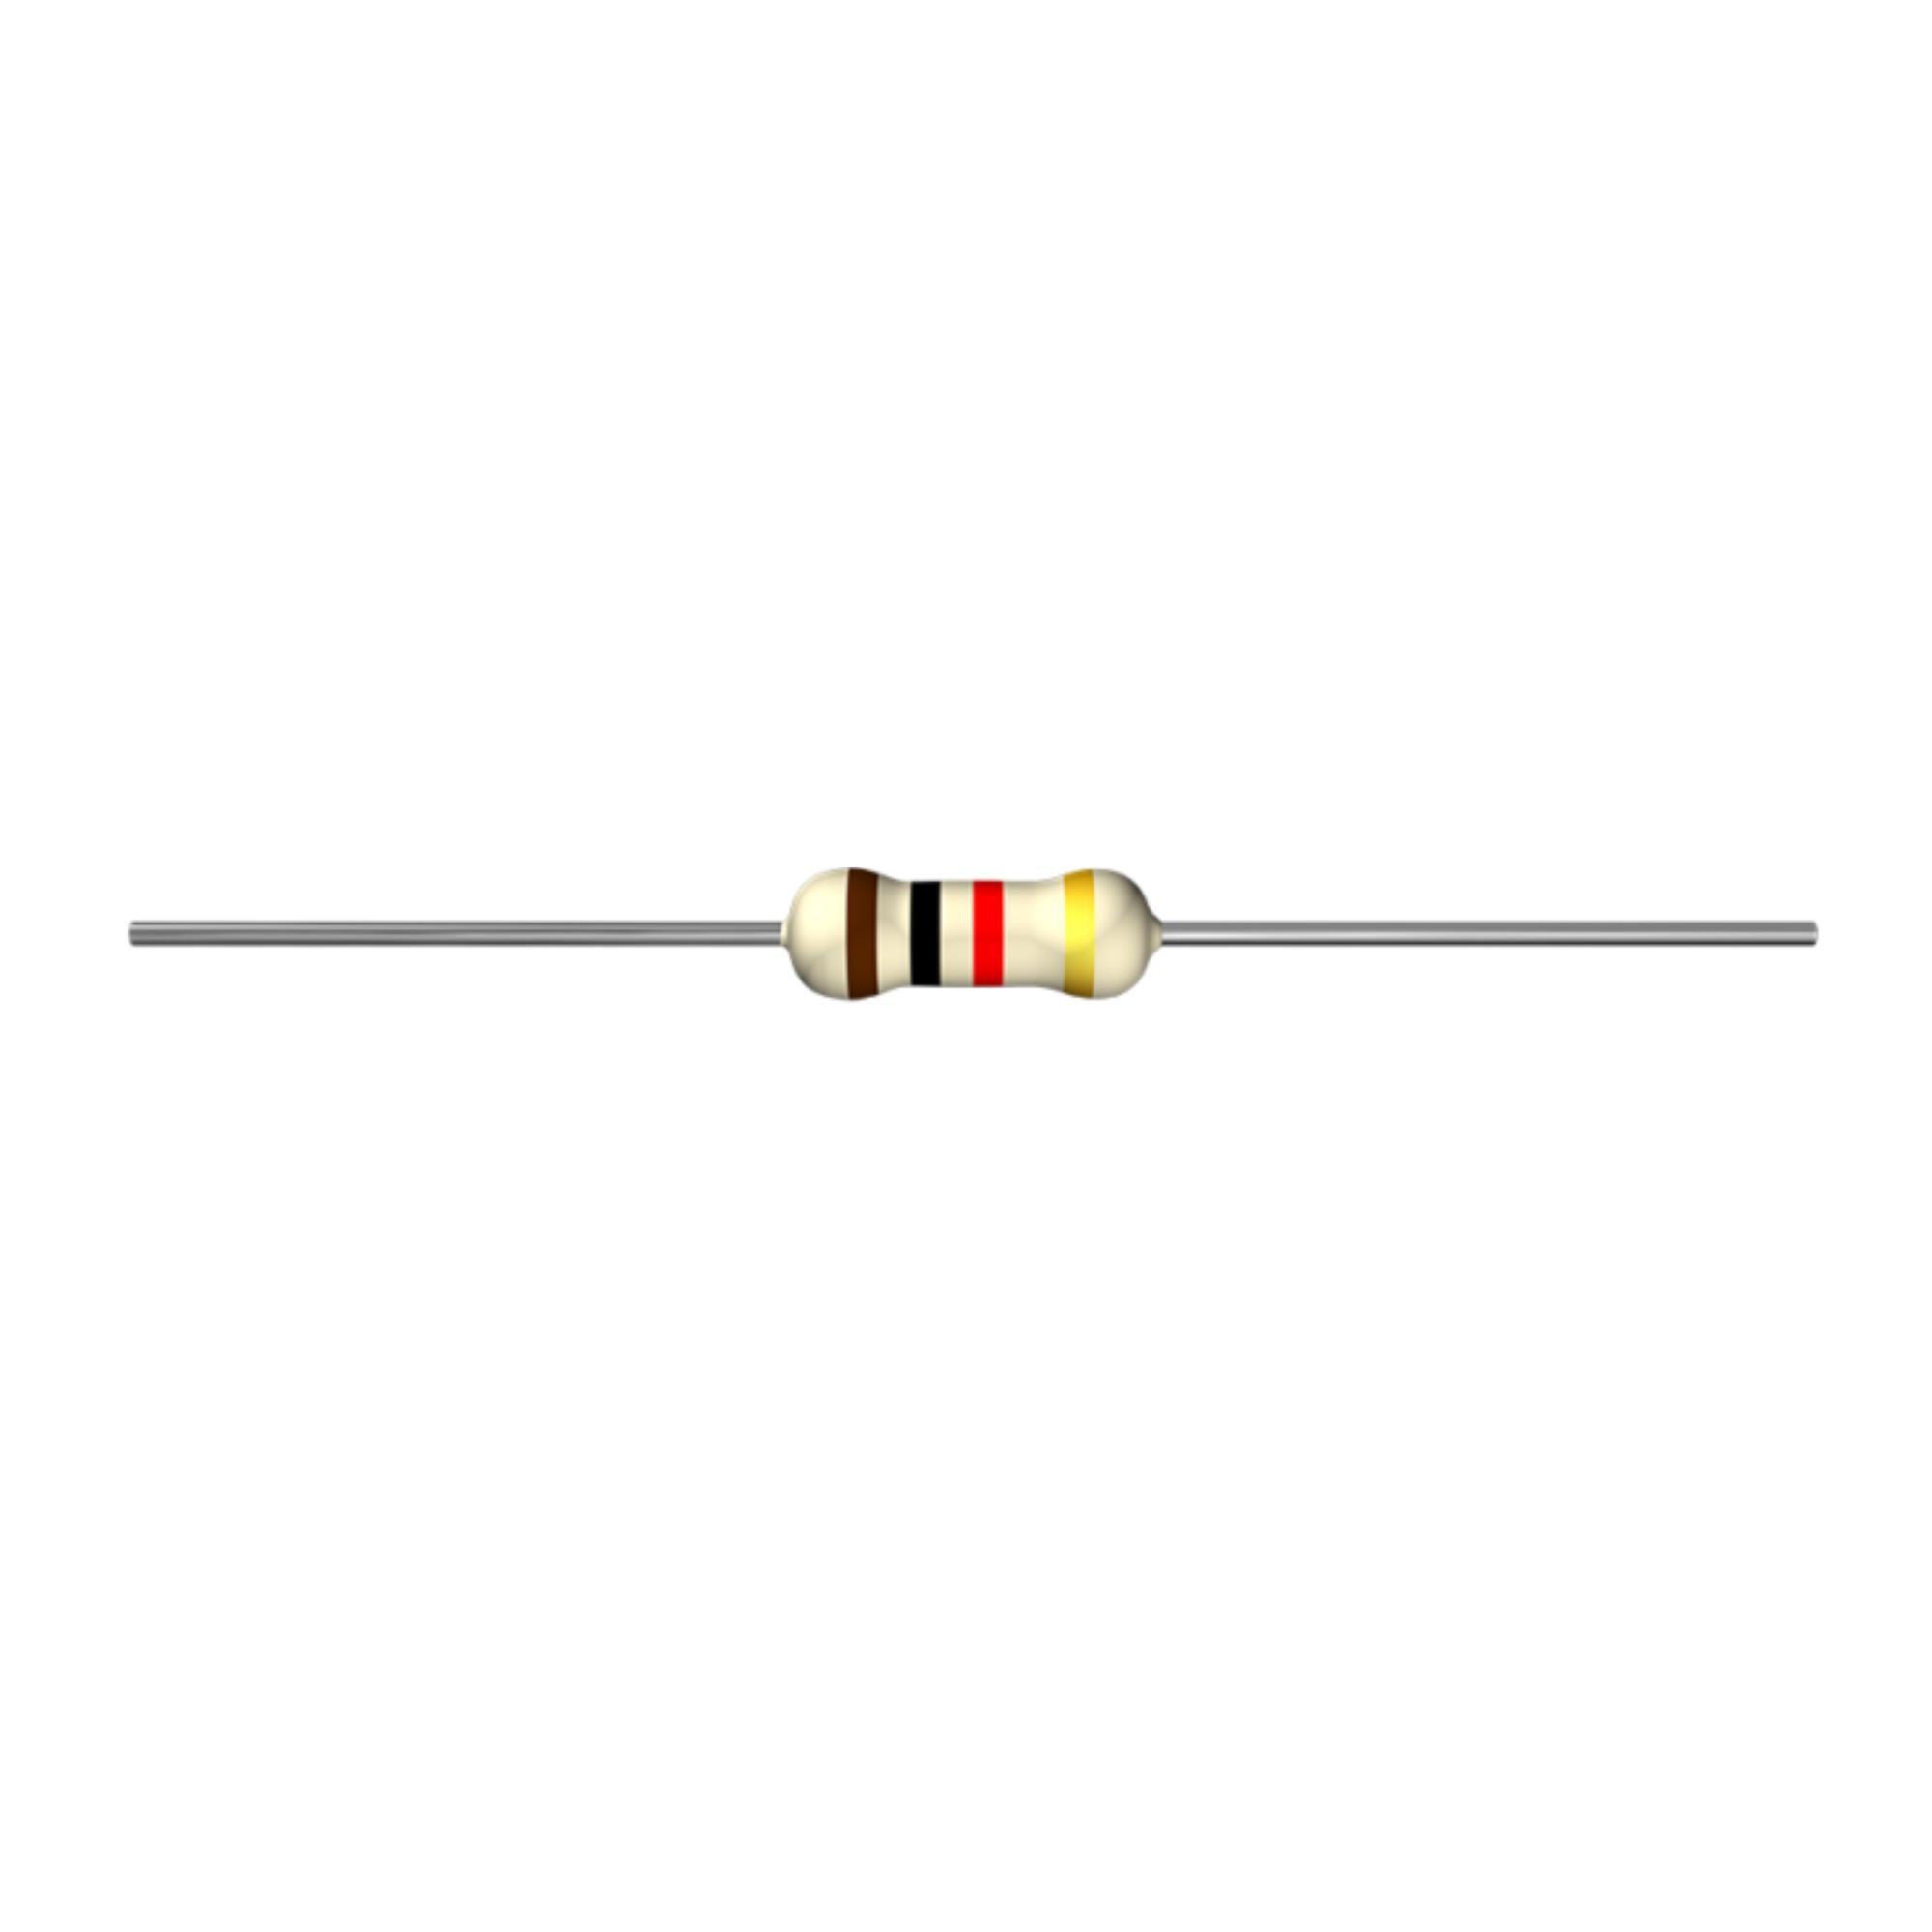 Resistor 6,8k CR25 1/4W 5% C/ 10 Unidades